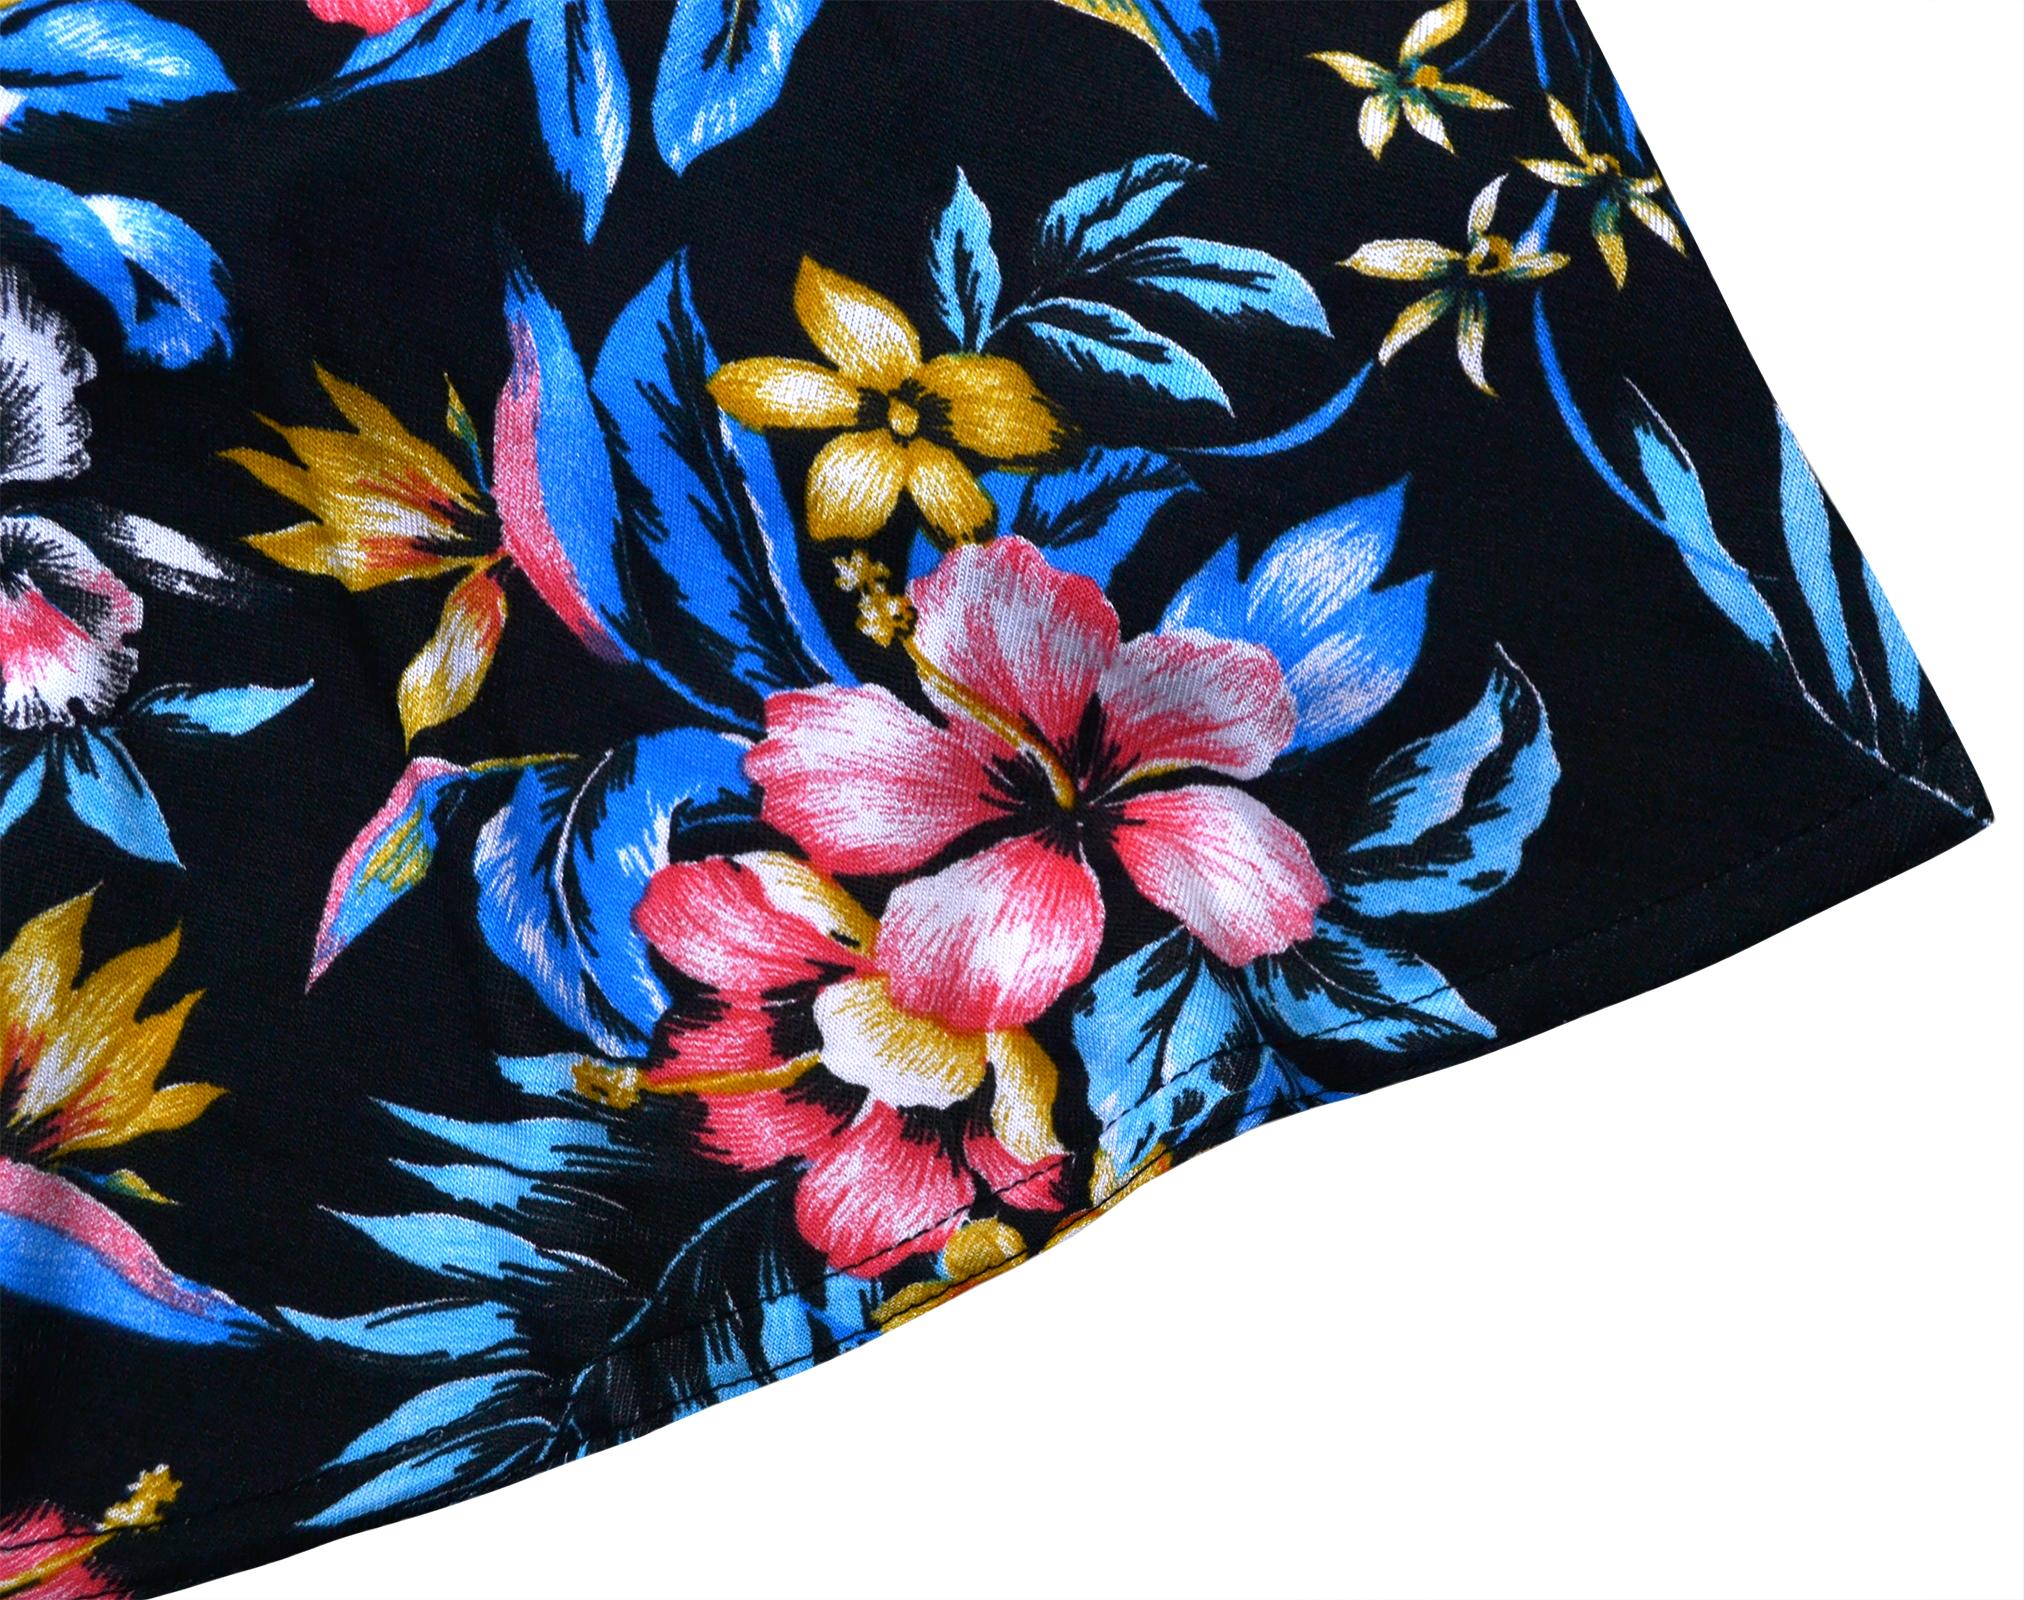 Girls-New-Floral-Skater-Dress-Kids-Summer-Party-Black-Dresses-7-8-9-10-11-12-13Y thumbnail 4